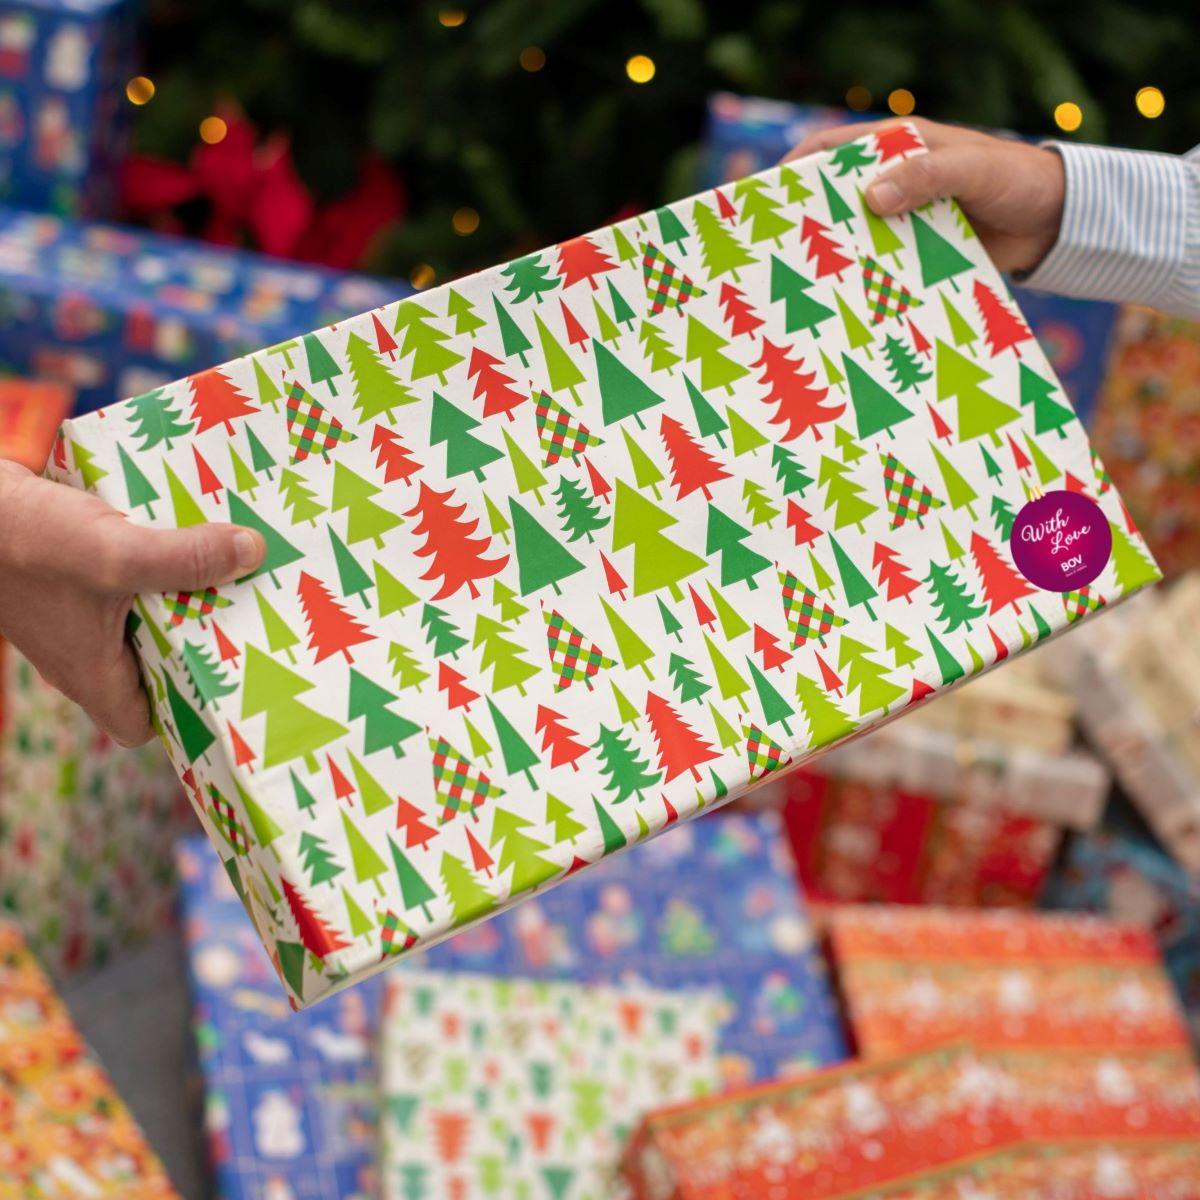 Bank of Valletta donates gifts to 200 children